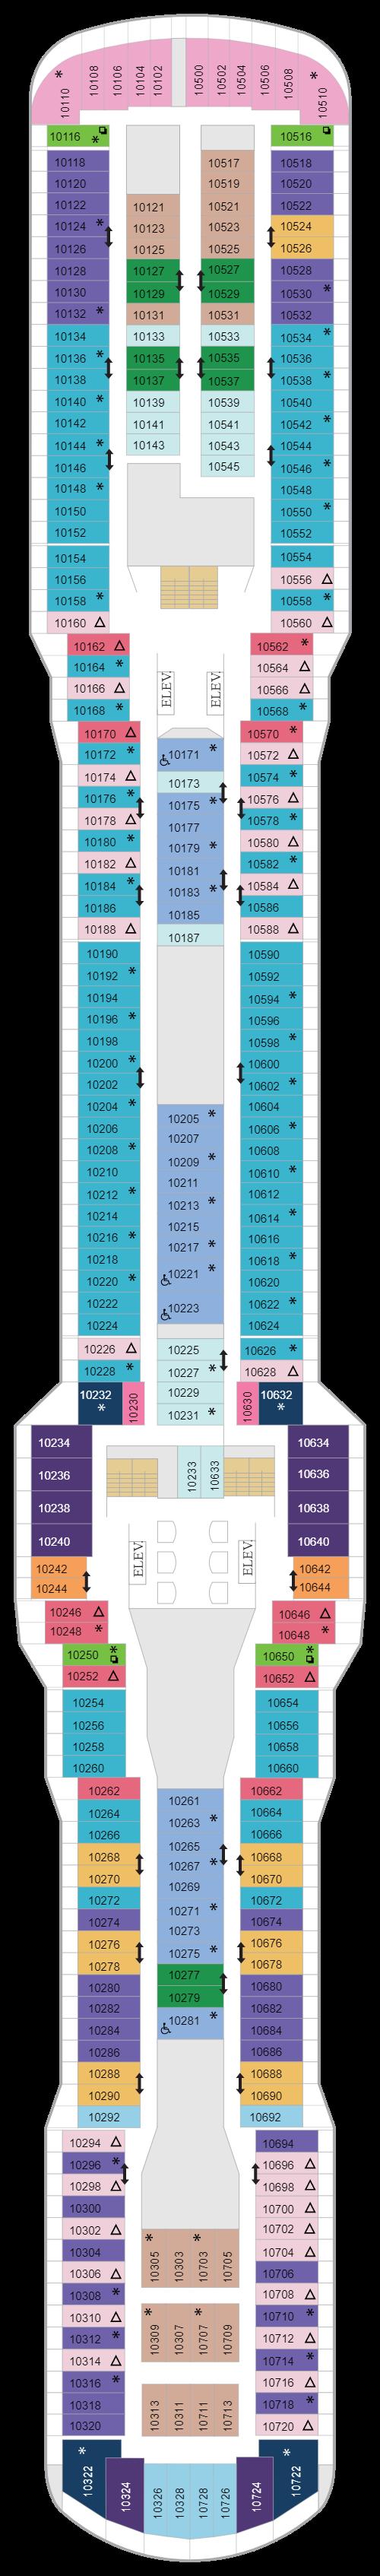 Deck 10 (January 24th, 2021 - Jan12th, 2022)